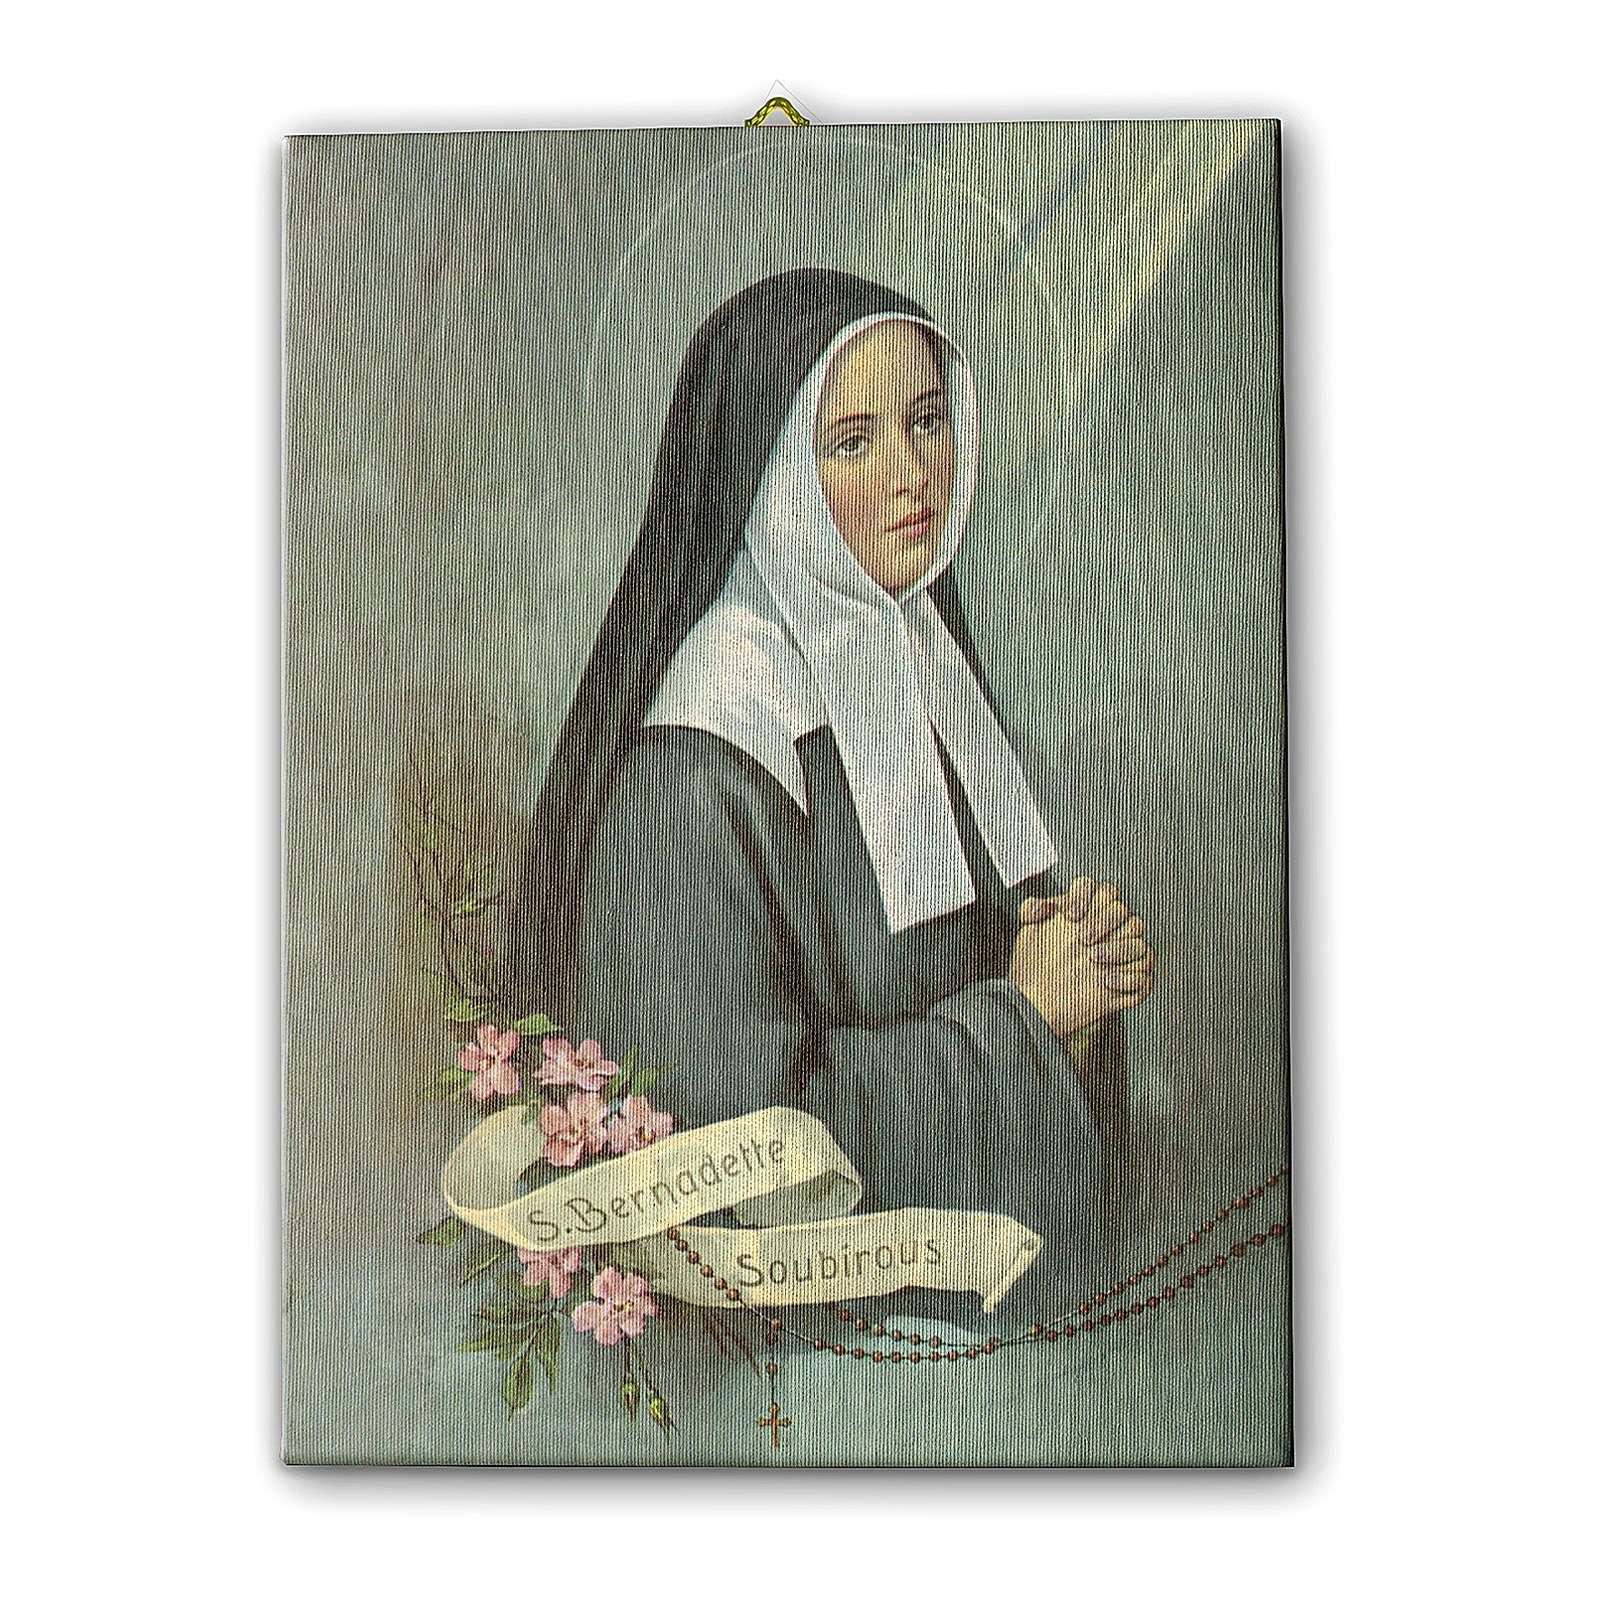 Quadro su tela pittorica Santa Bernadette 25x20 cm 3